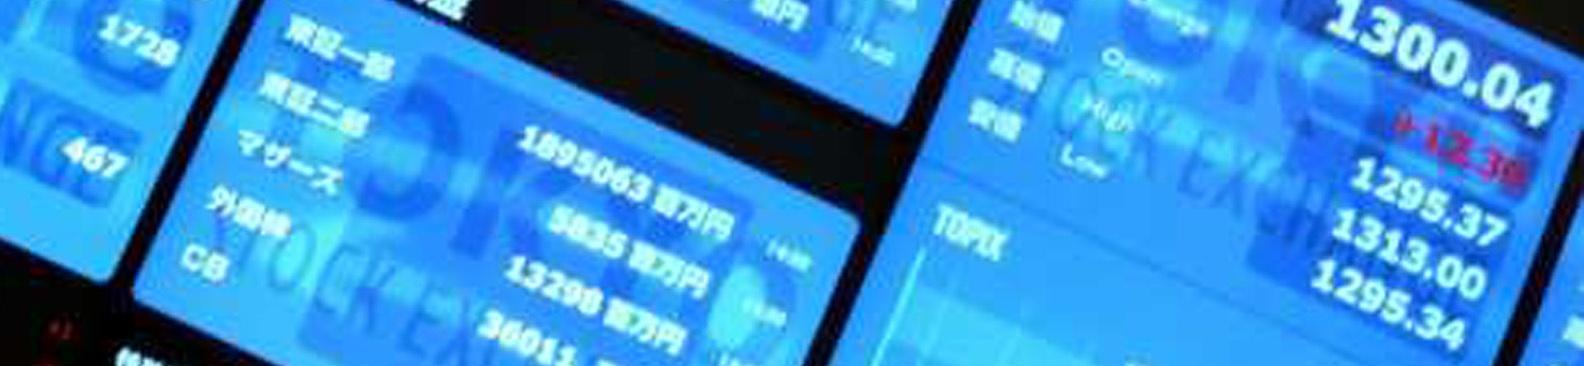 1584x366-stocks.jpg